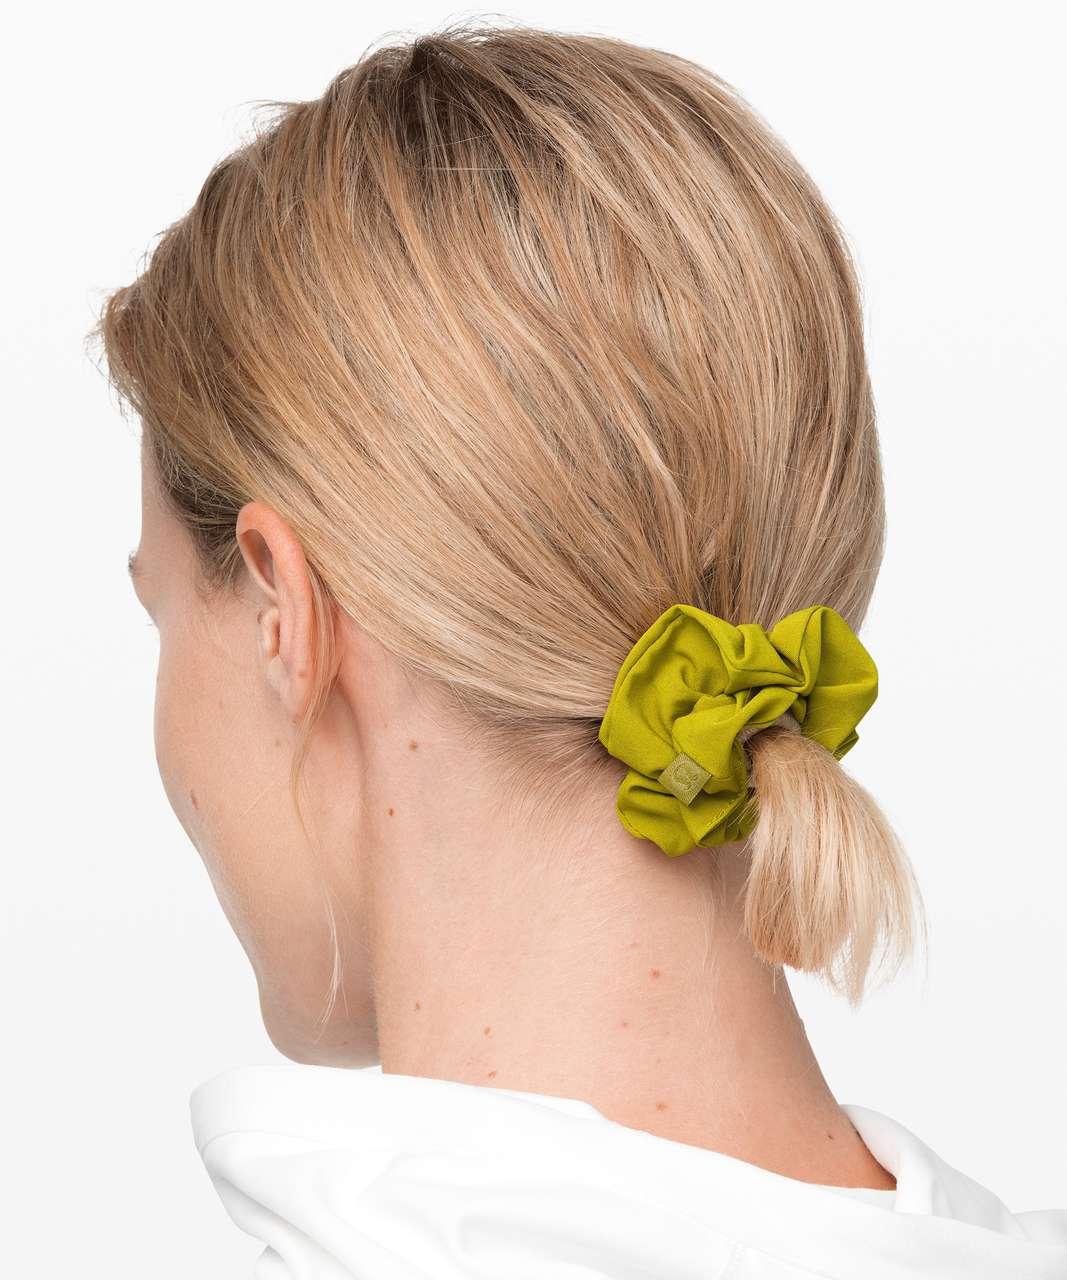 Lululemon Uplifting Scrunchie - Golden Lime